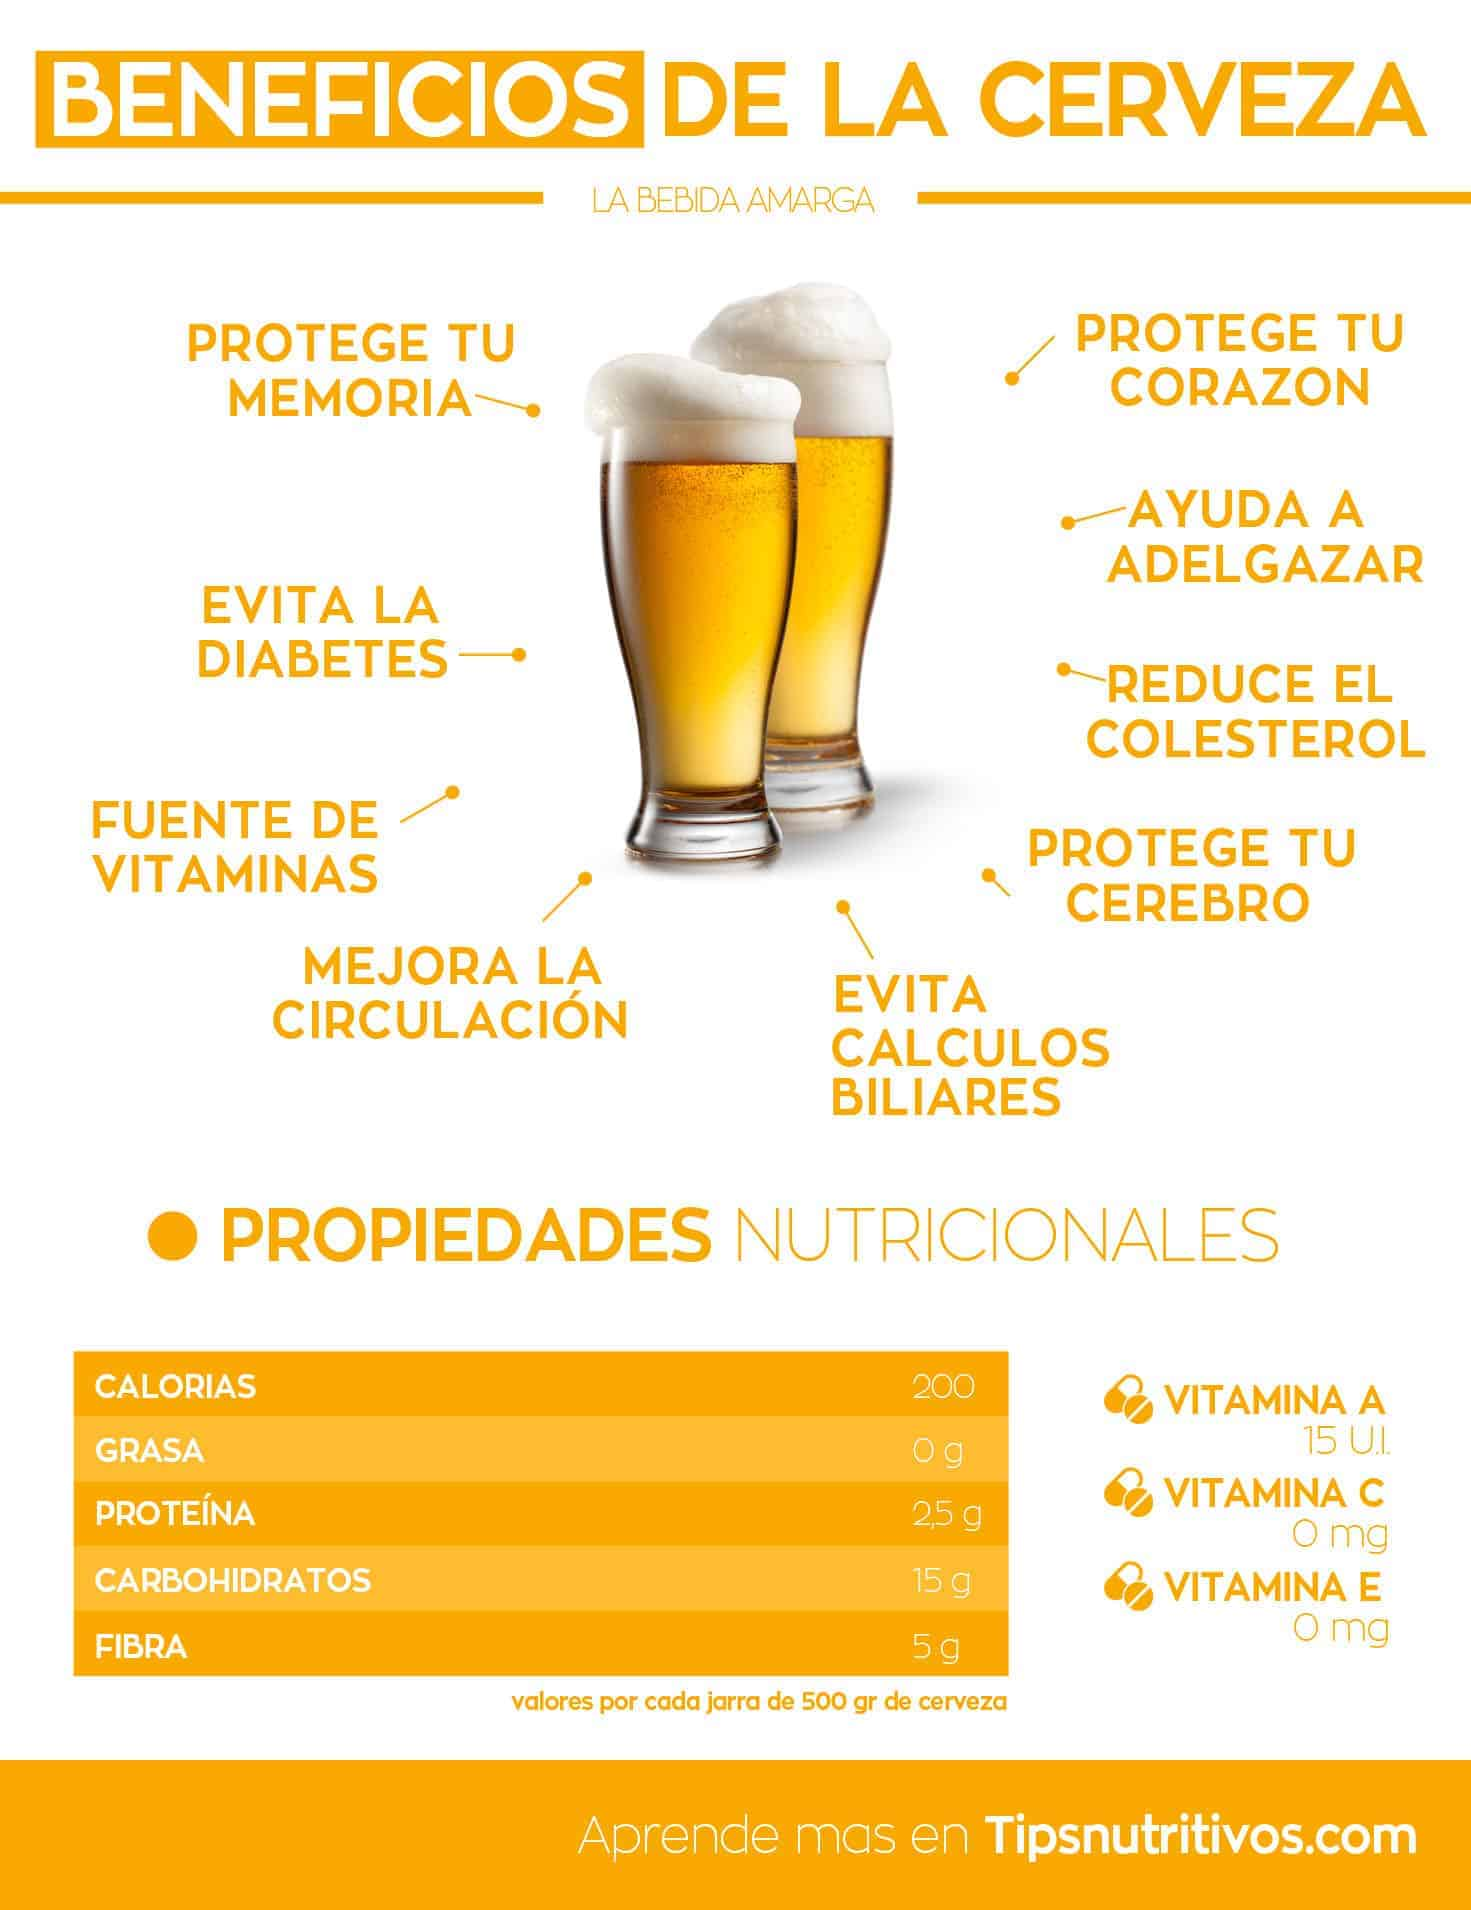 Beneficios de la cerveza - Infografia